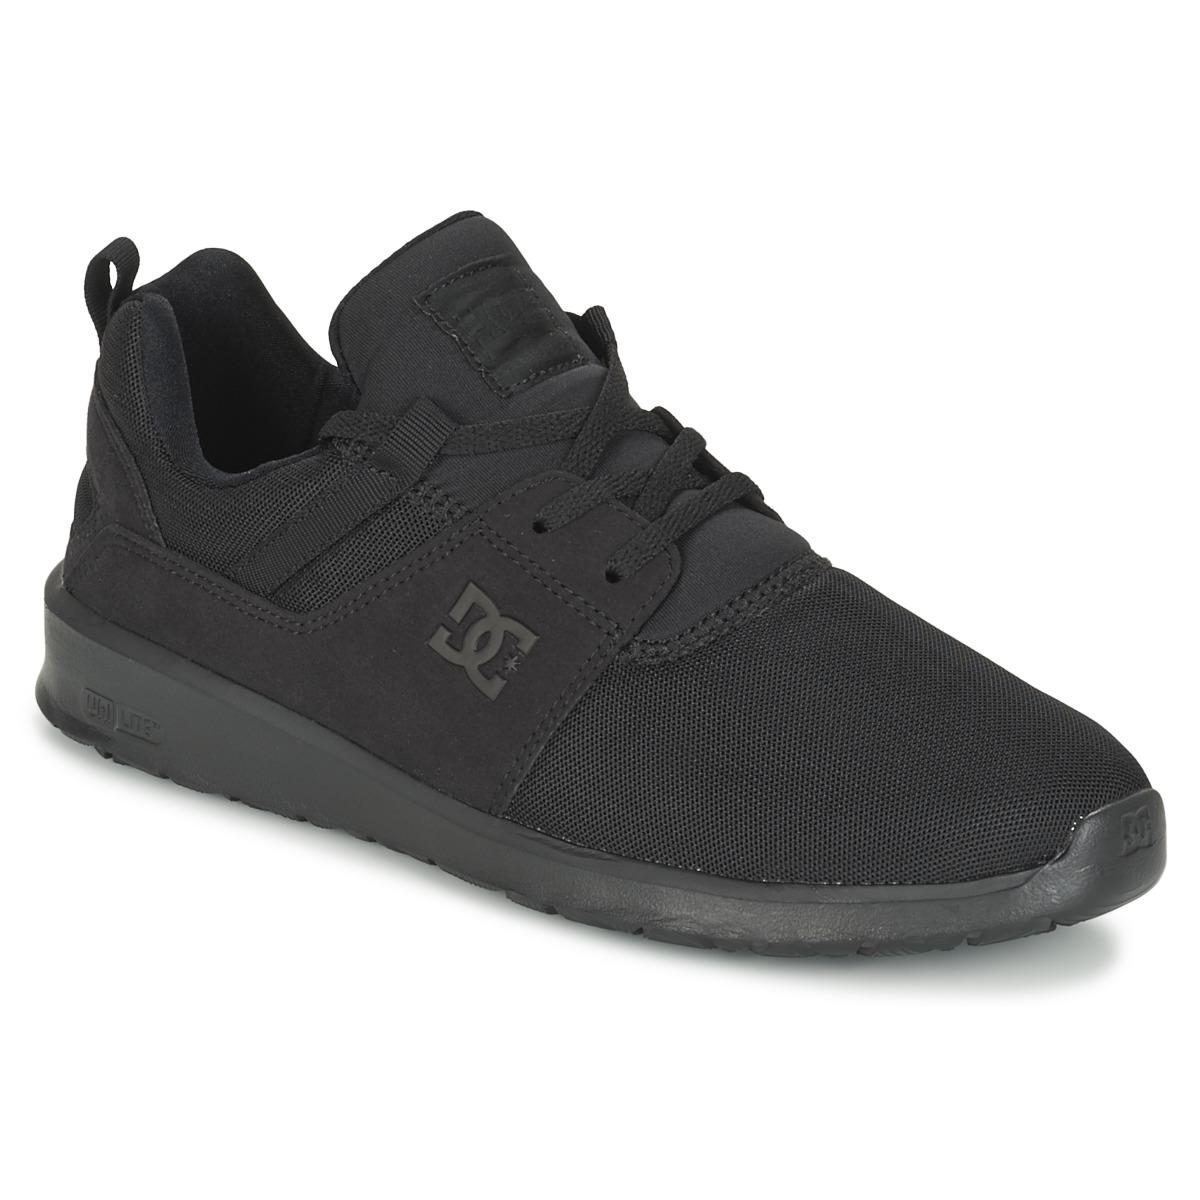 DC Shoes HEATHROW M SHOE 3BK Schwarz - Kostenloser Versand bei Spartoode ! - Schuhe Sneaker Low Herren 59,49 €